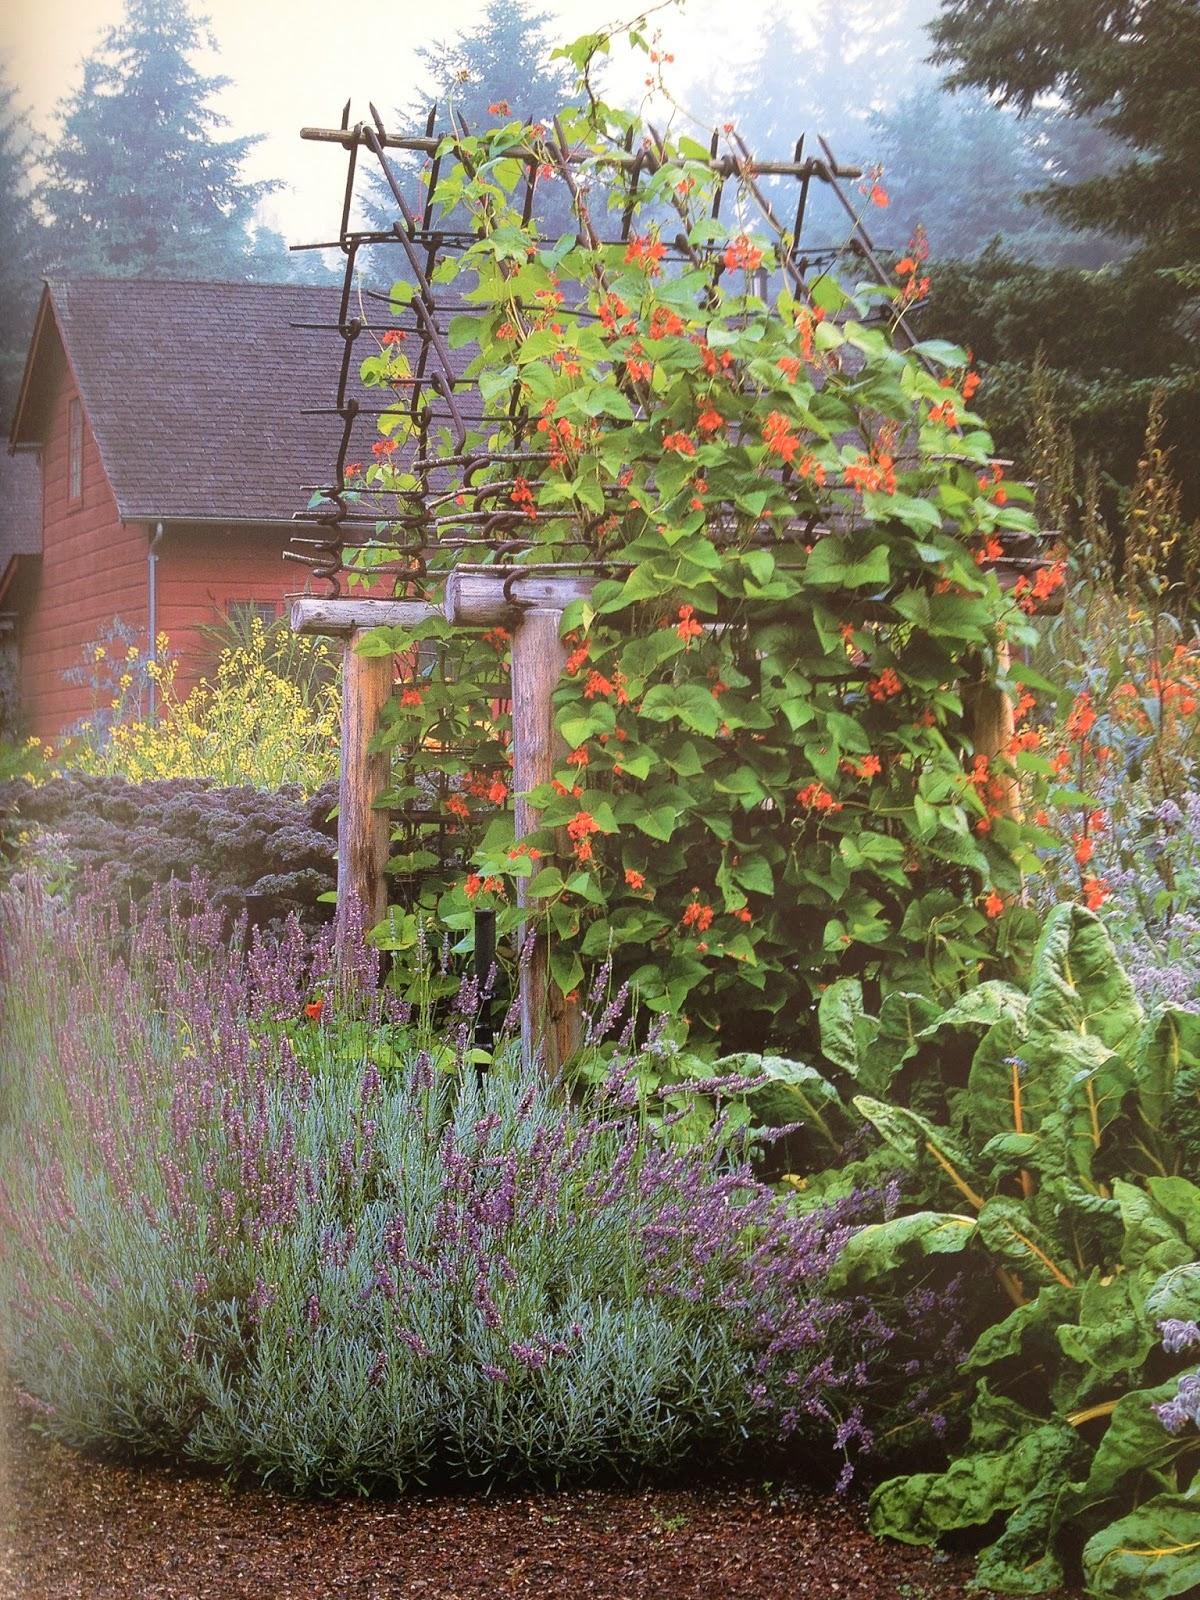 Jardin vintage un v ritable art de vivre for Jardin veritable